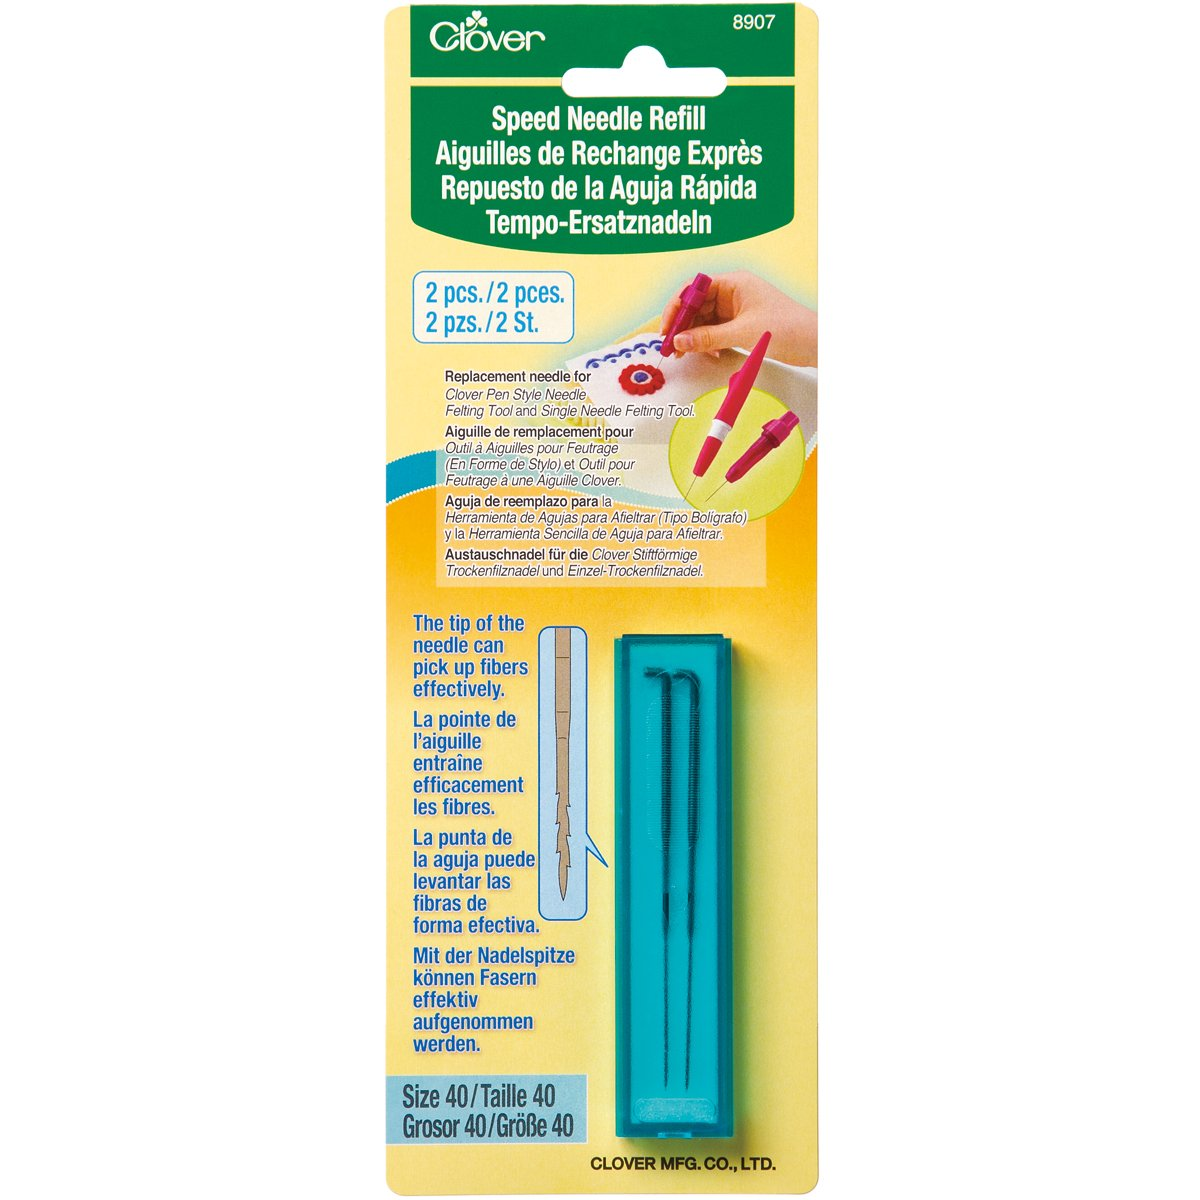 Clover Speed Needle Refill 8907